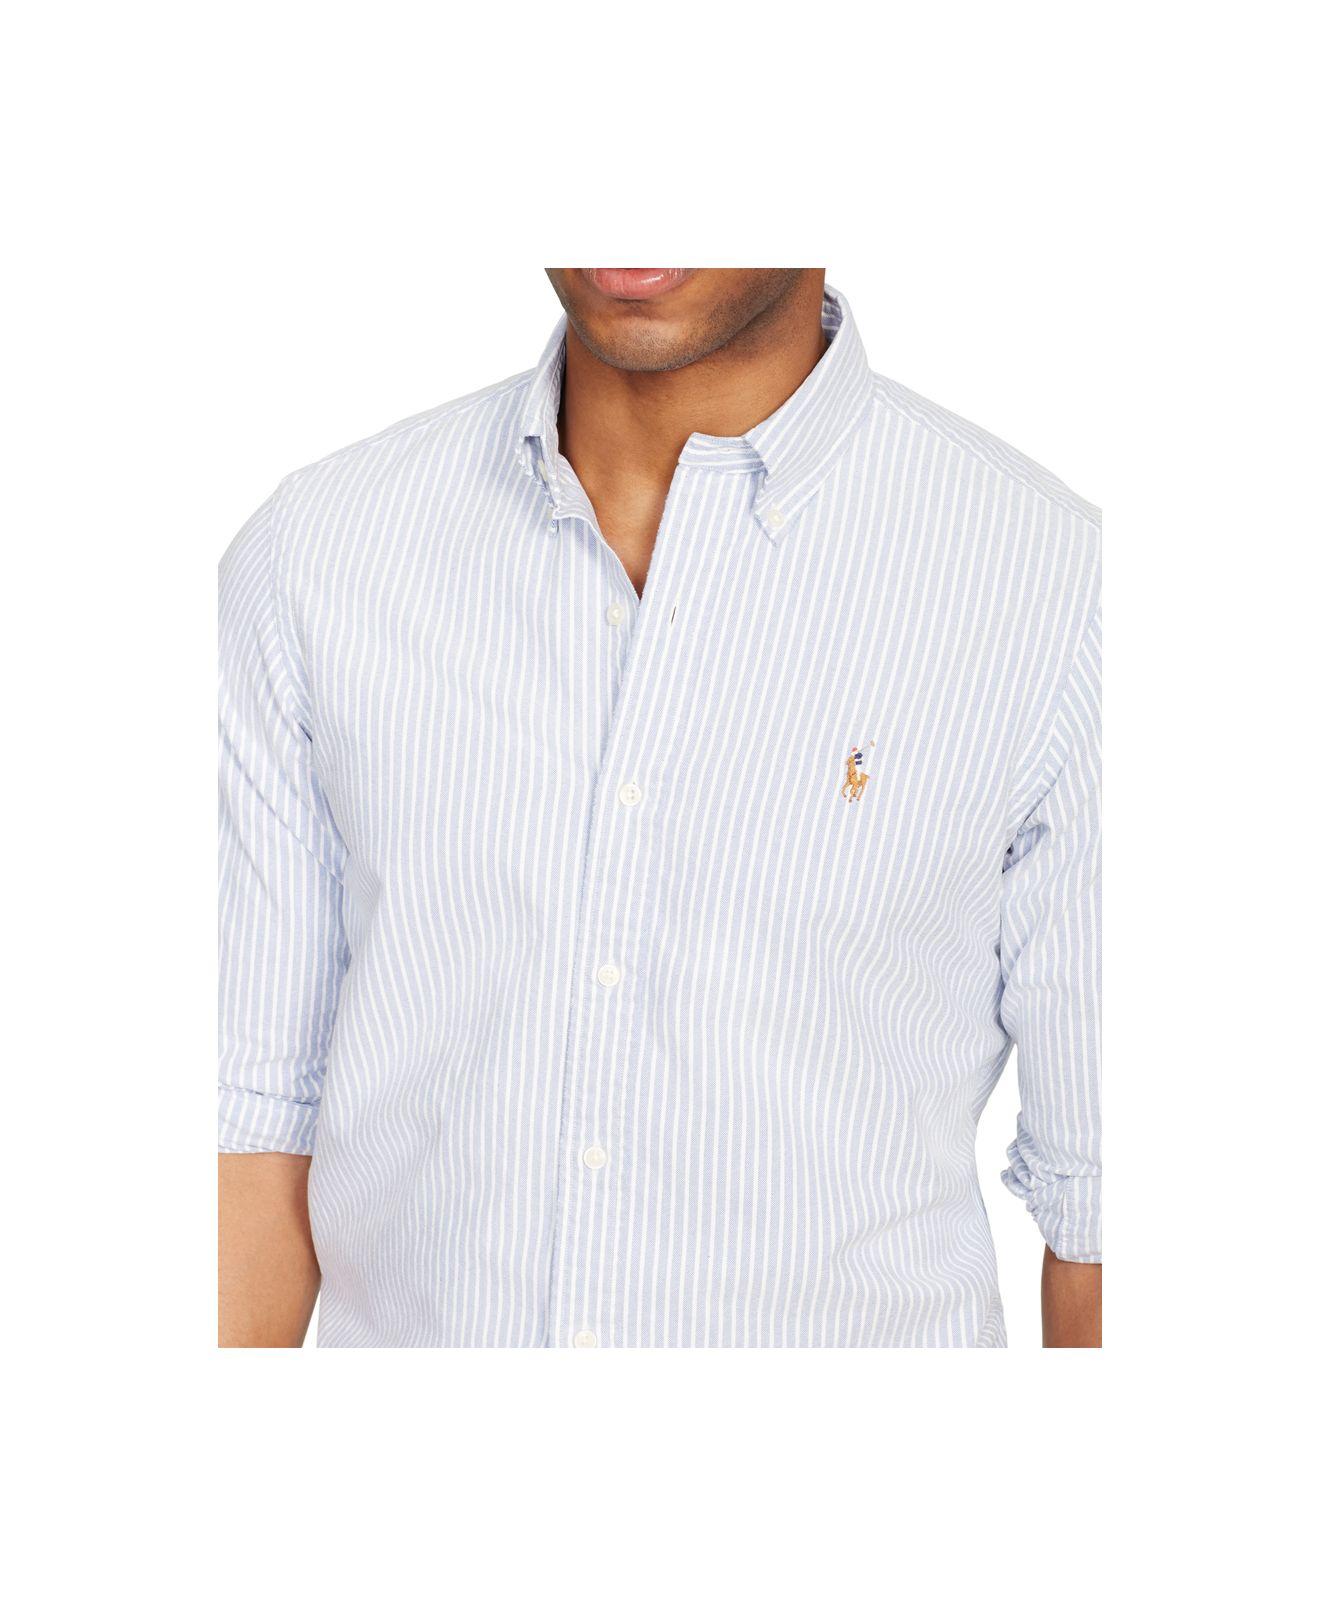 63b1a19d10e58 top quality lyst polo ralph lauren slim fit striped stretch oxford shirt in  a842f 7cb22